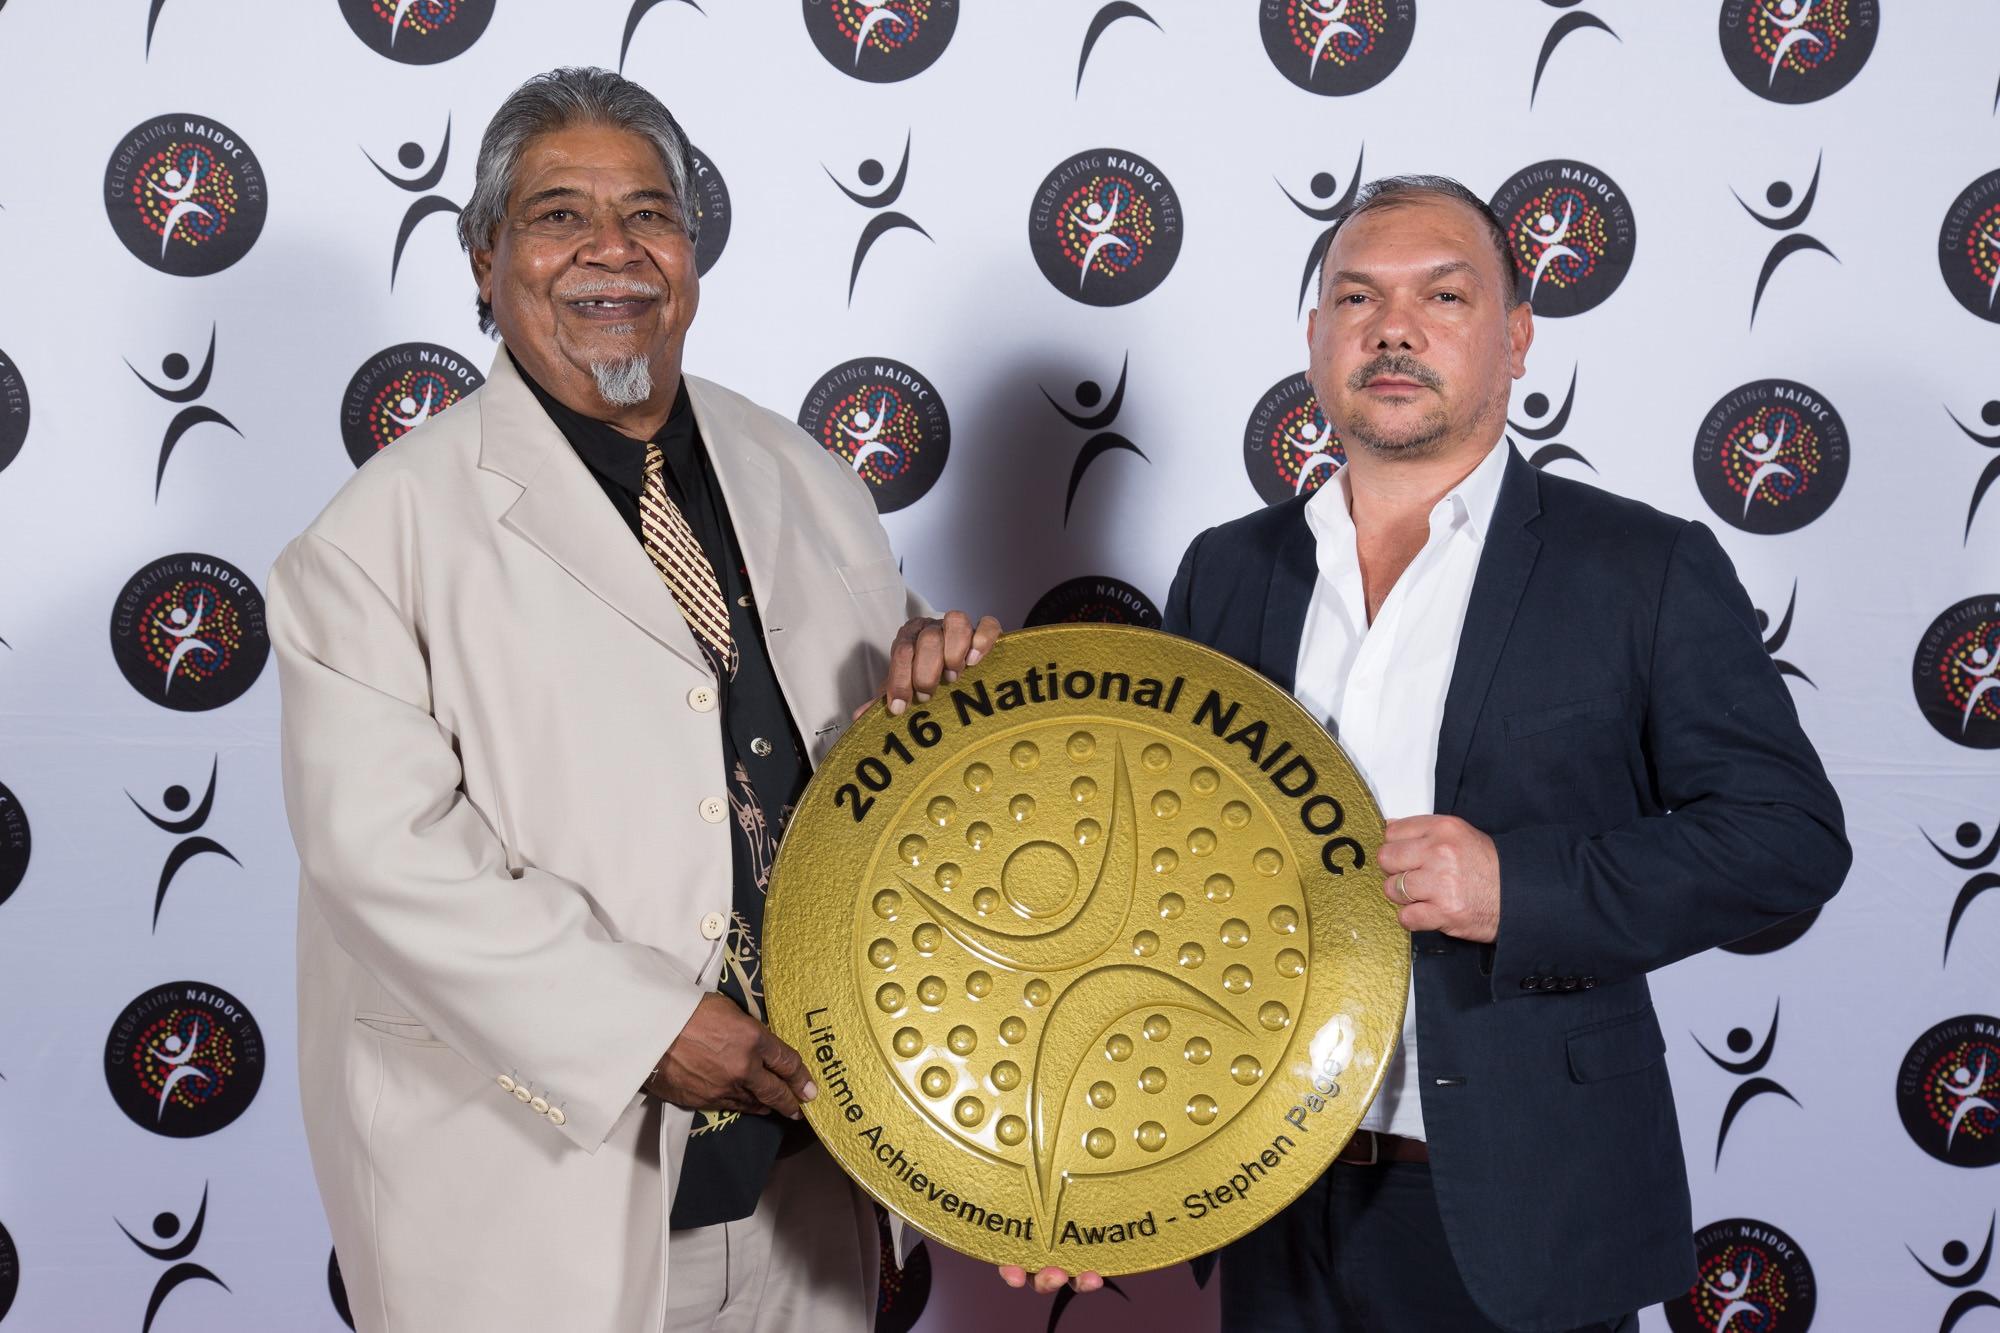 NAIDOC Awards 2016 Lifetime Achievement award recipient, Stephen Page.